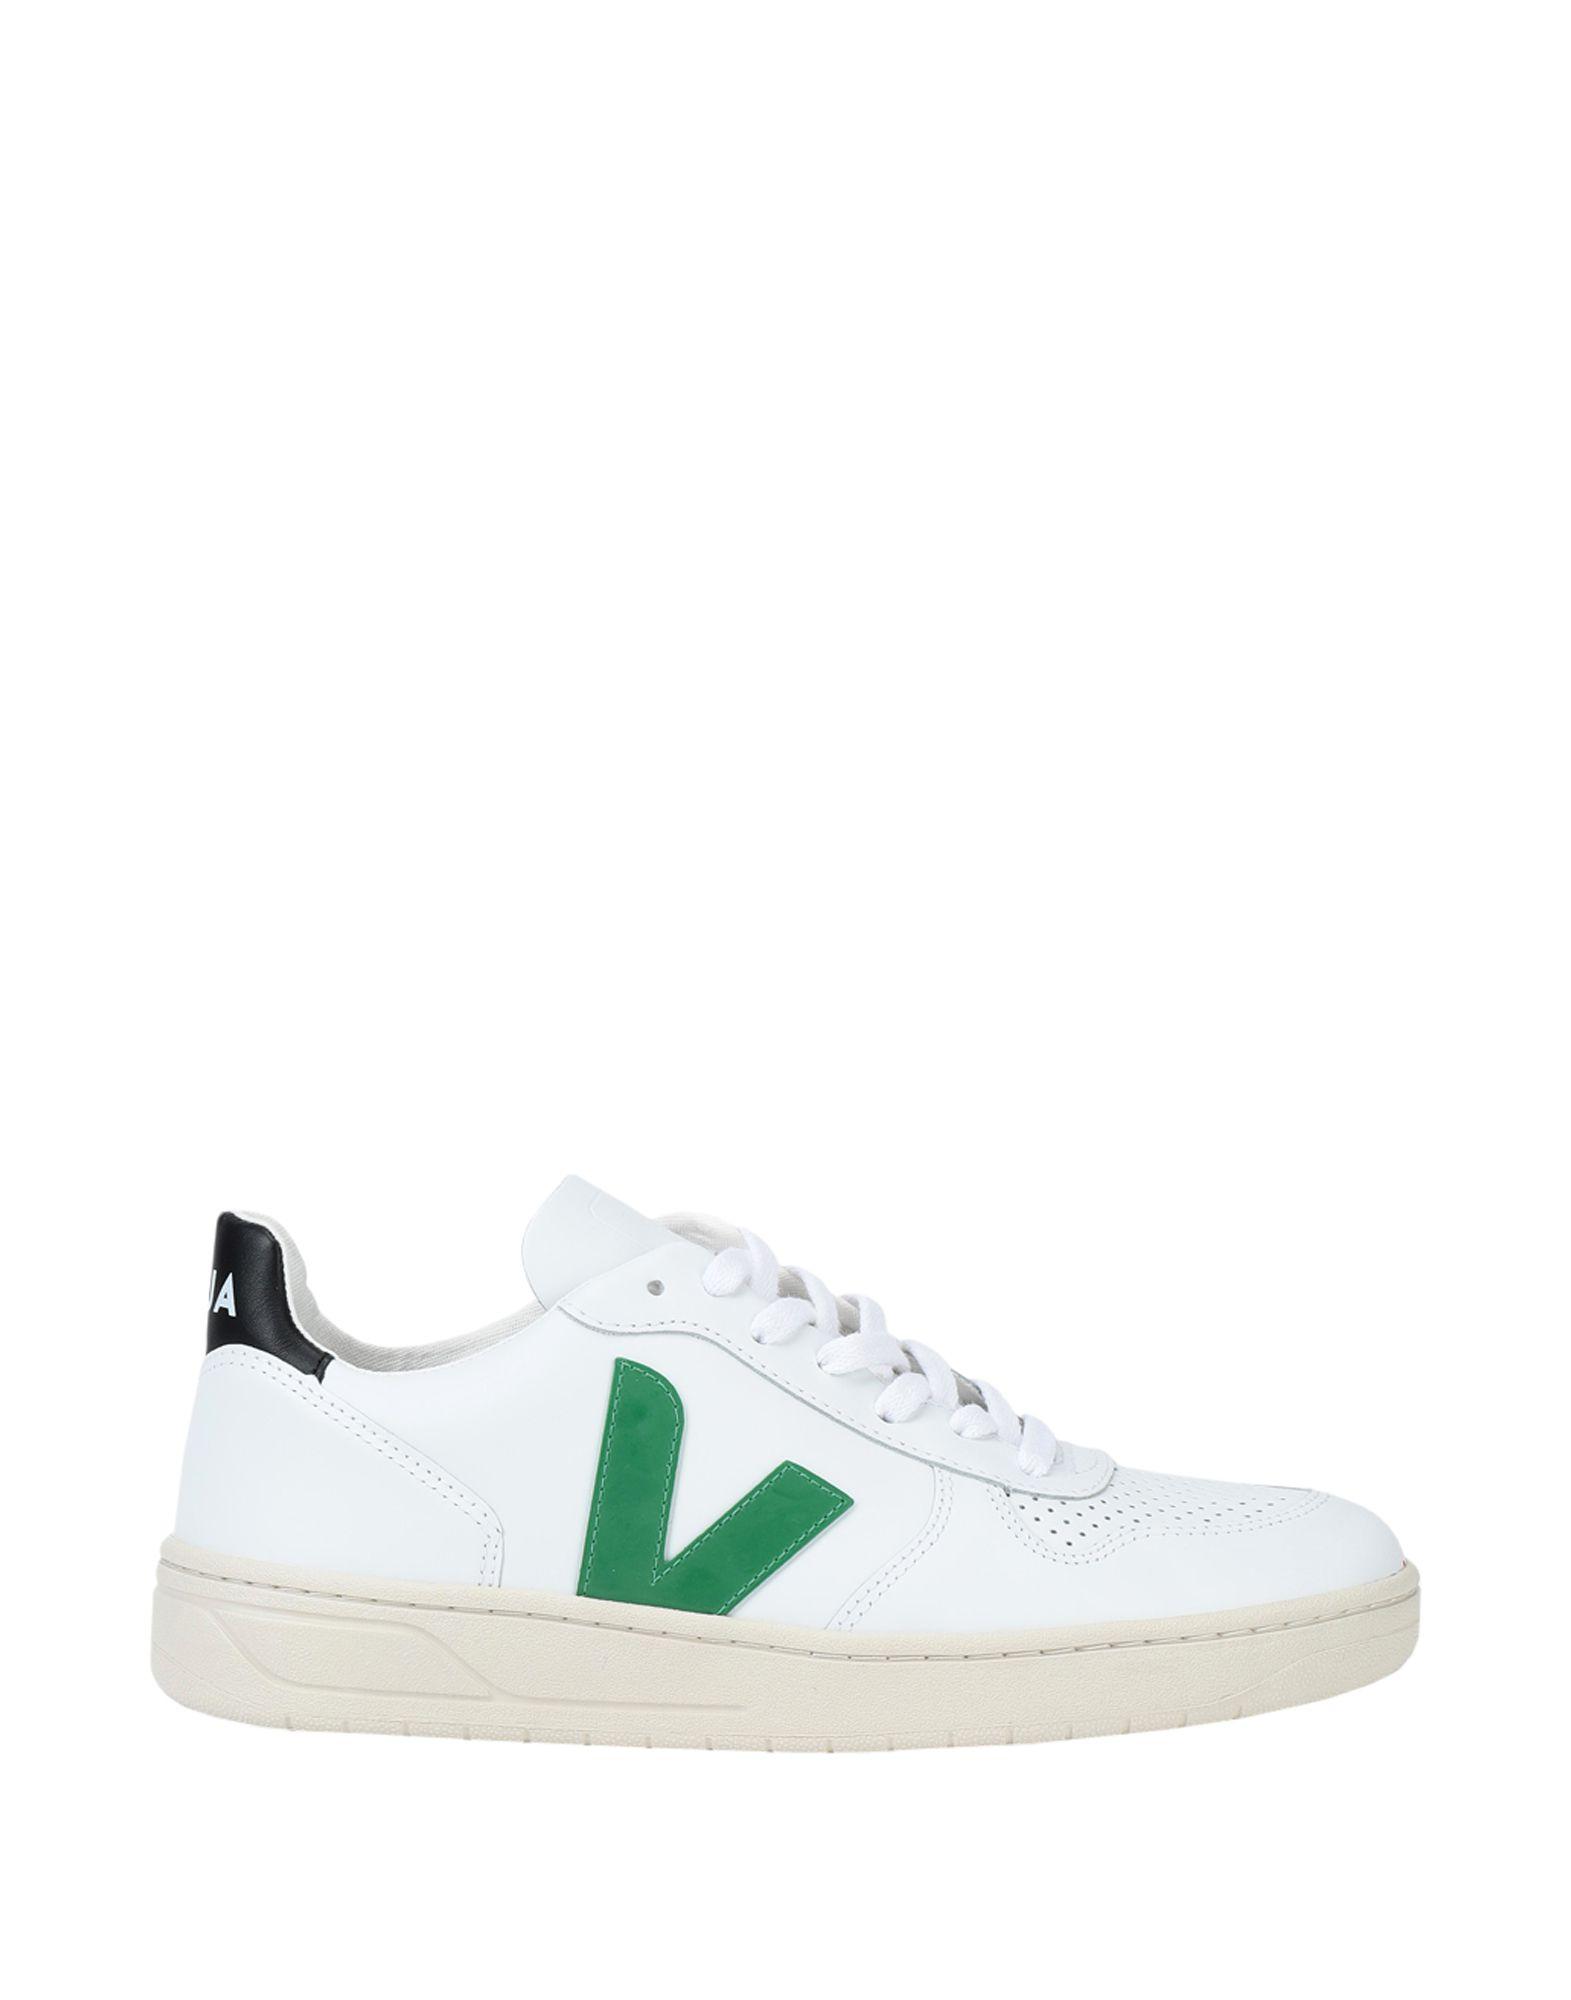 Veja Sneakers - Women  Veja Sneakers online on  Women Australia - 11568579QL 5b8951